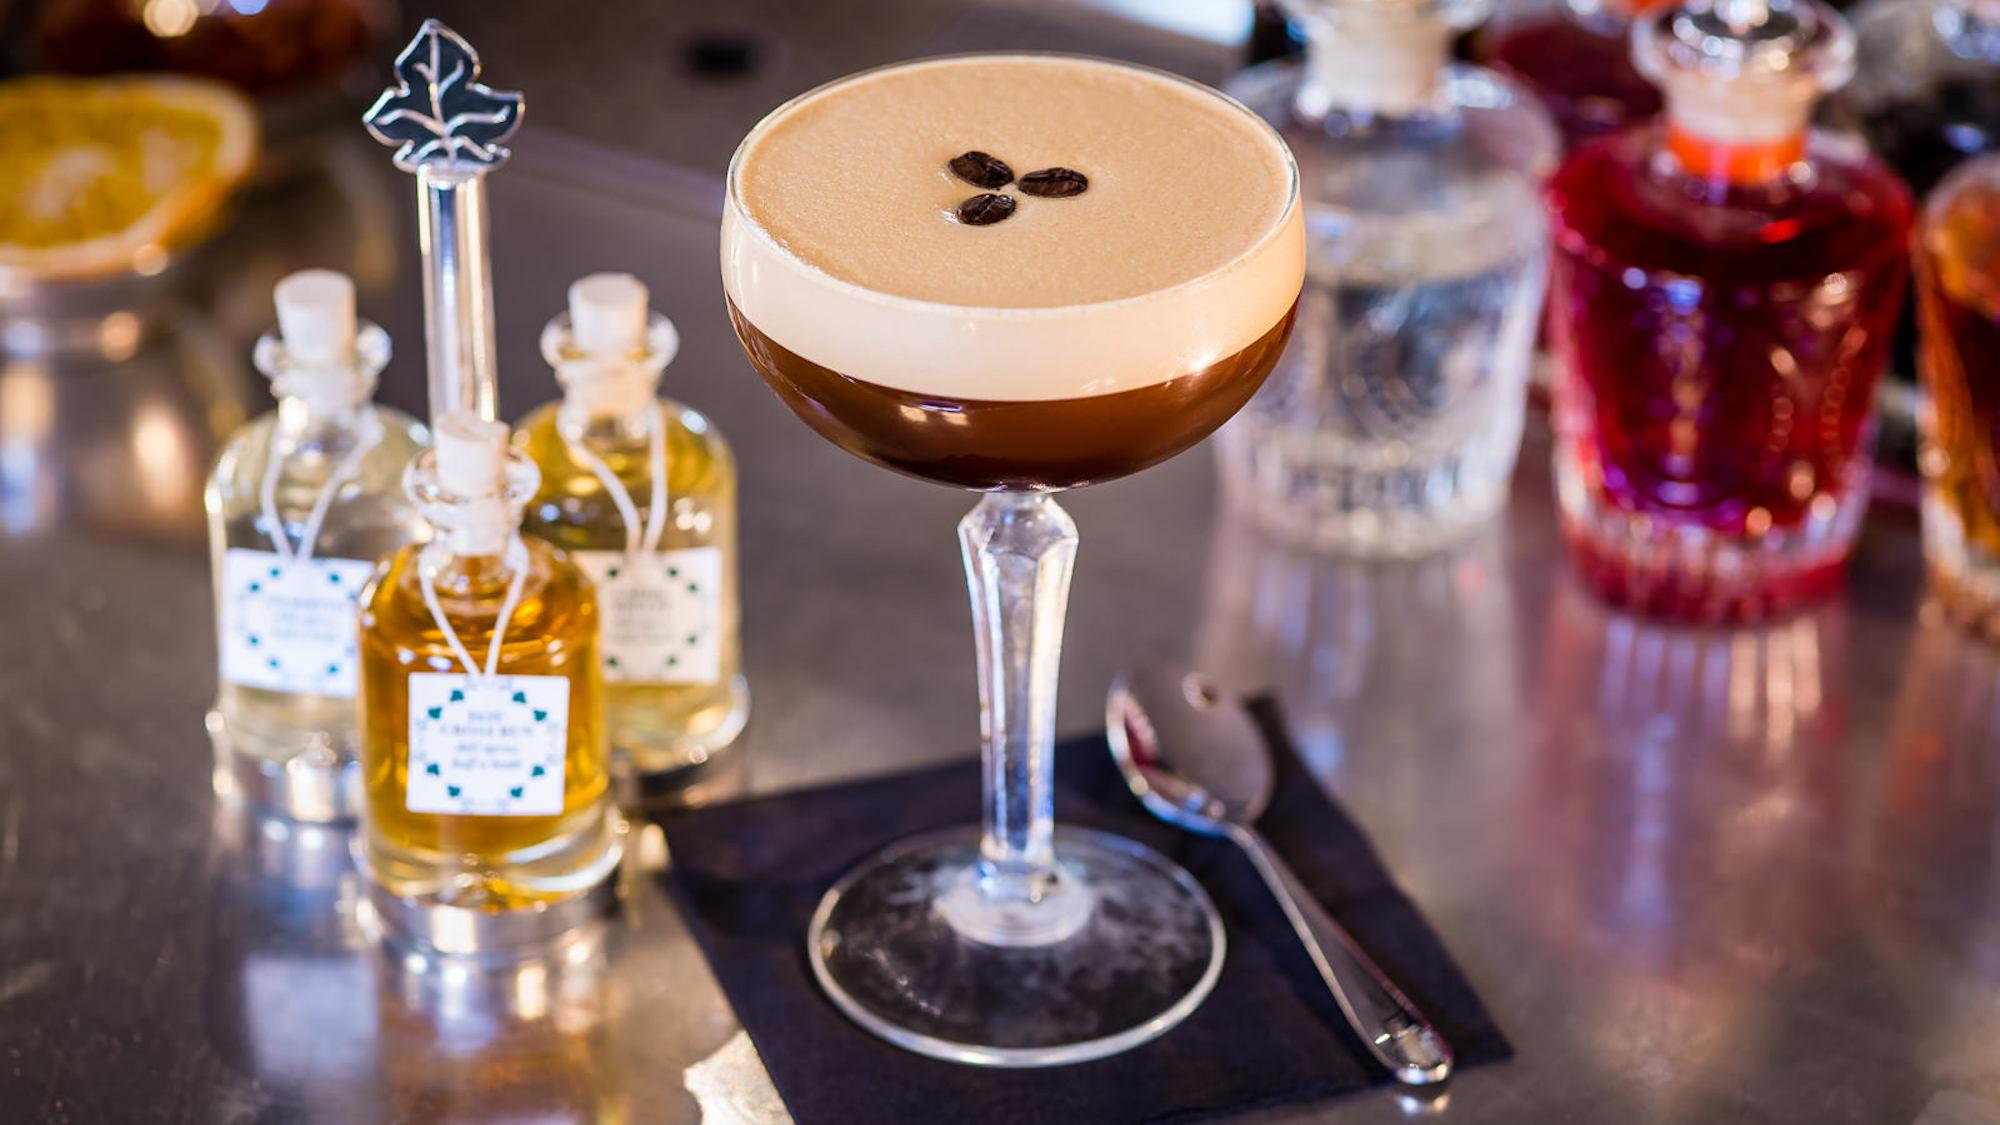 Salted Caramel Espresso Martini, The Ivy